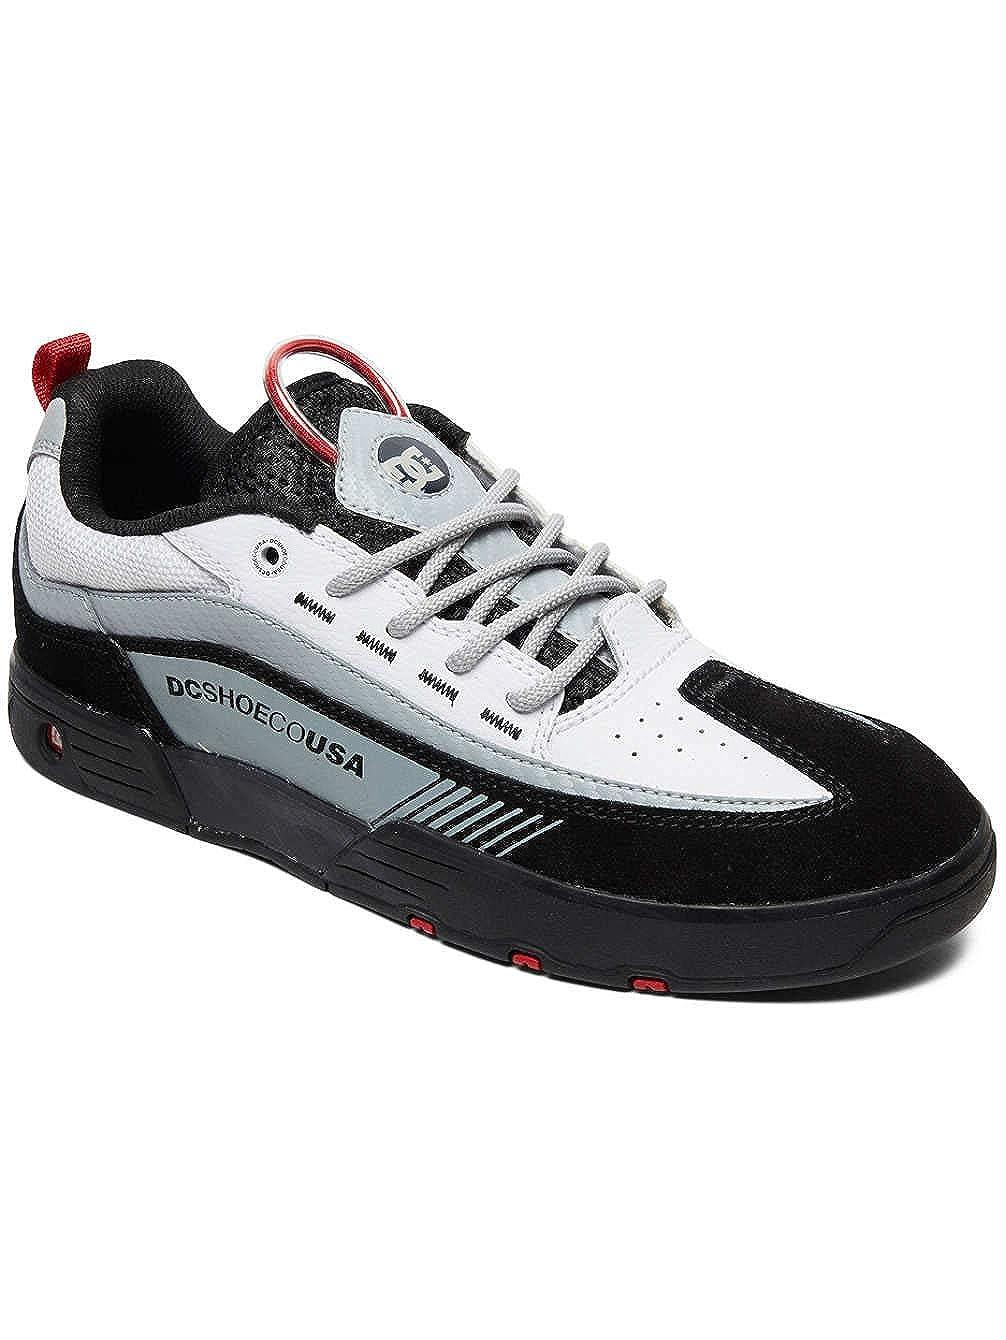 af91bc0a3b7f9 Amazon.com: DC Black-White-Red Legacy 98 Slim Shoe: Shoes